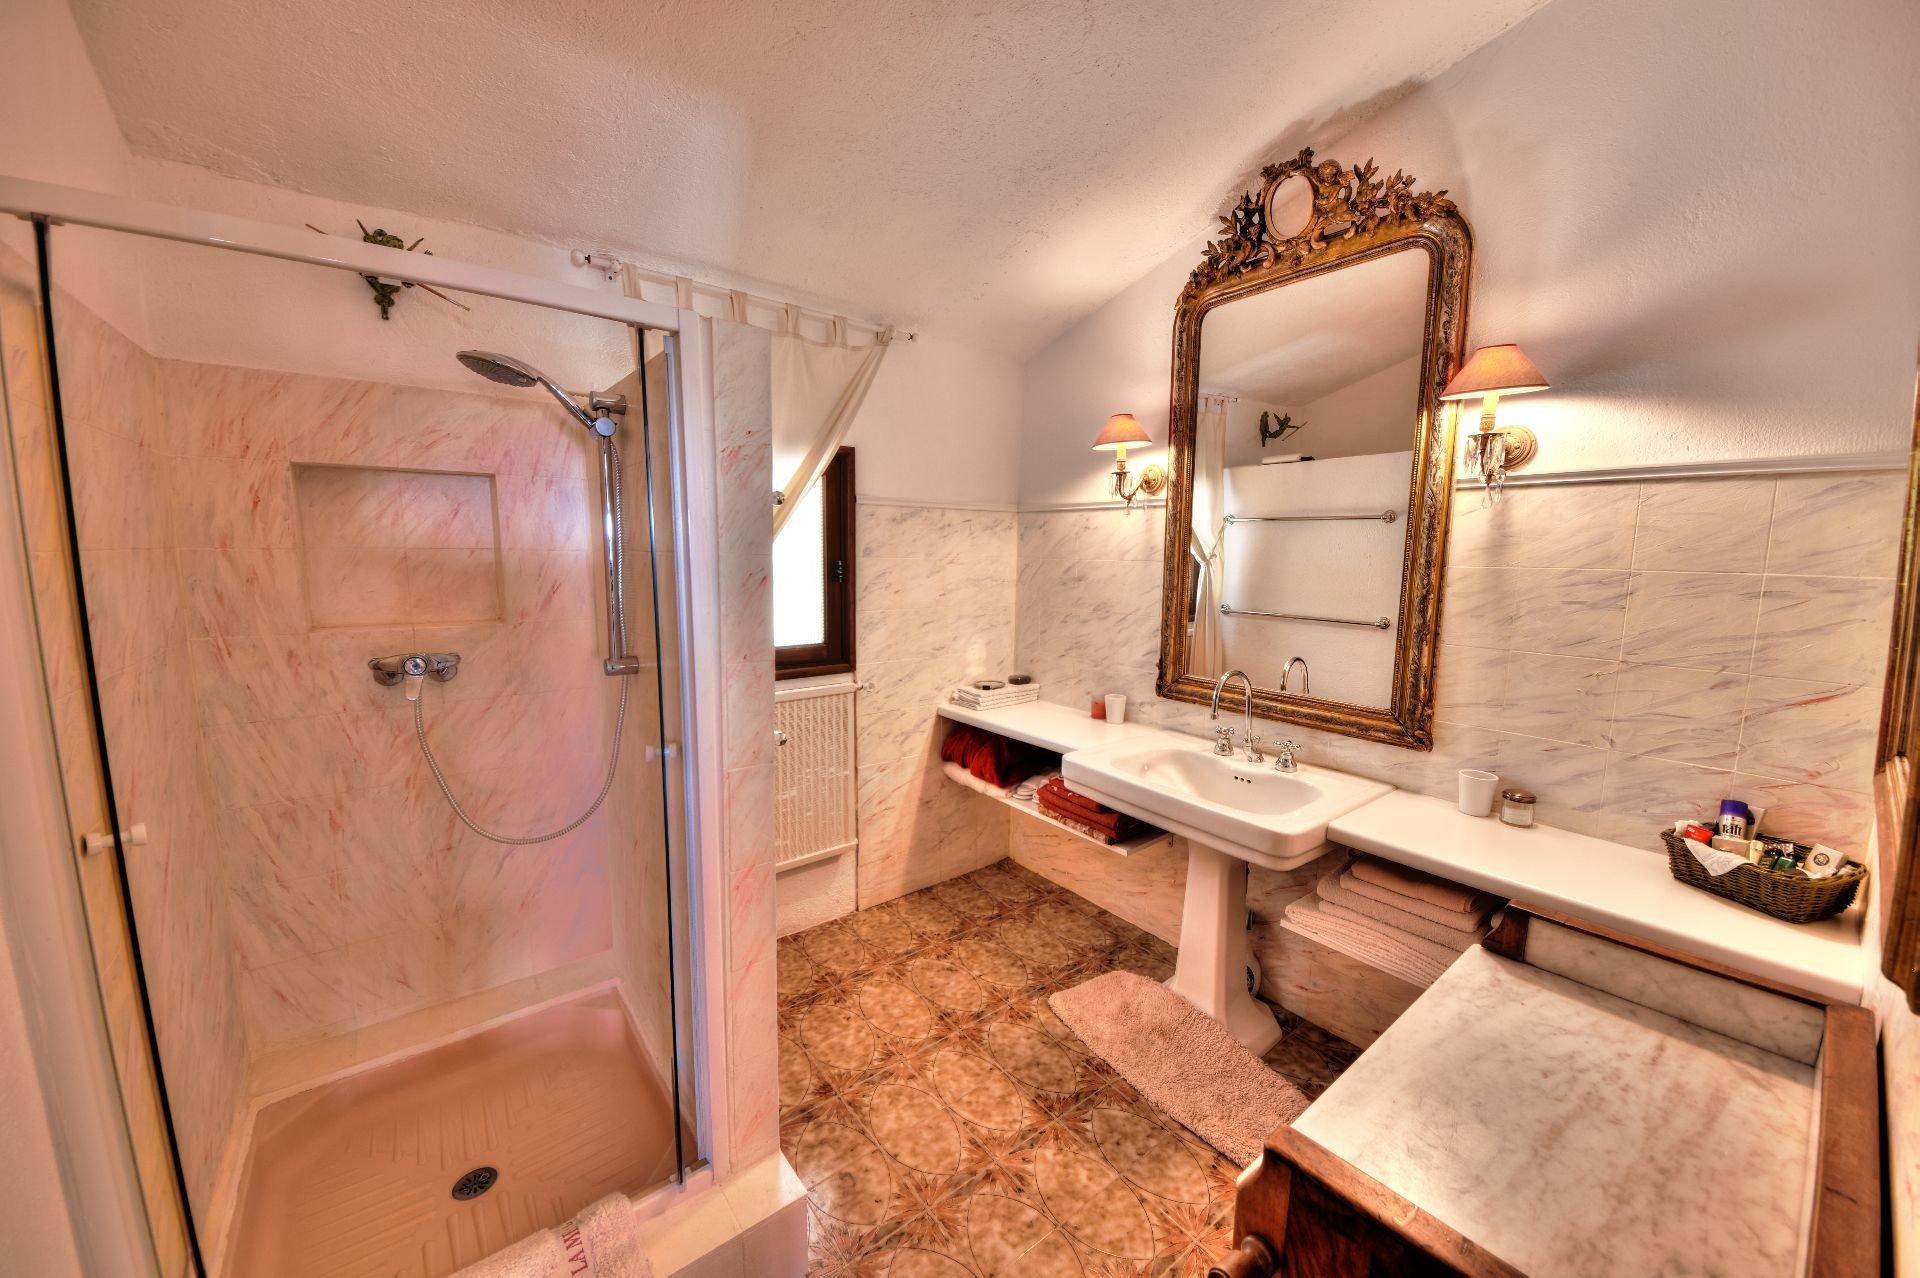 Salle de douche, carrelage